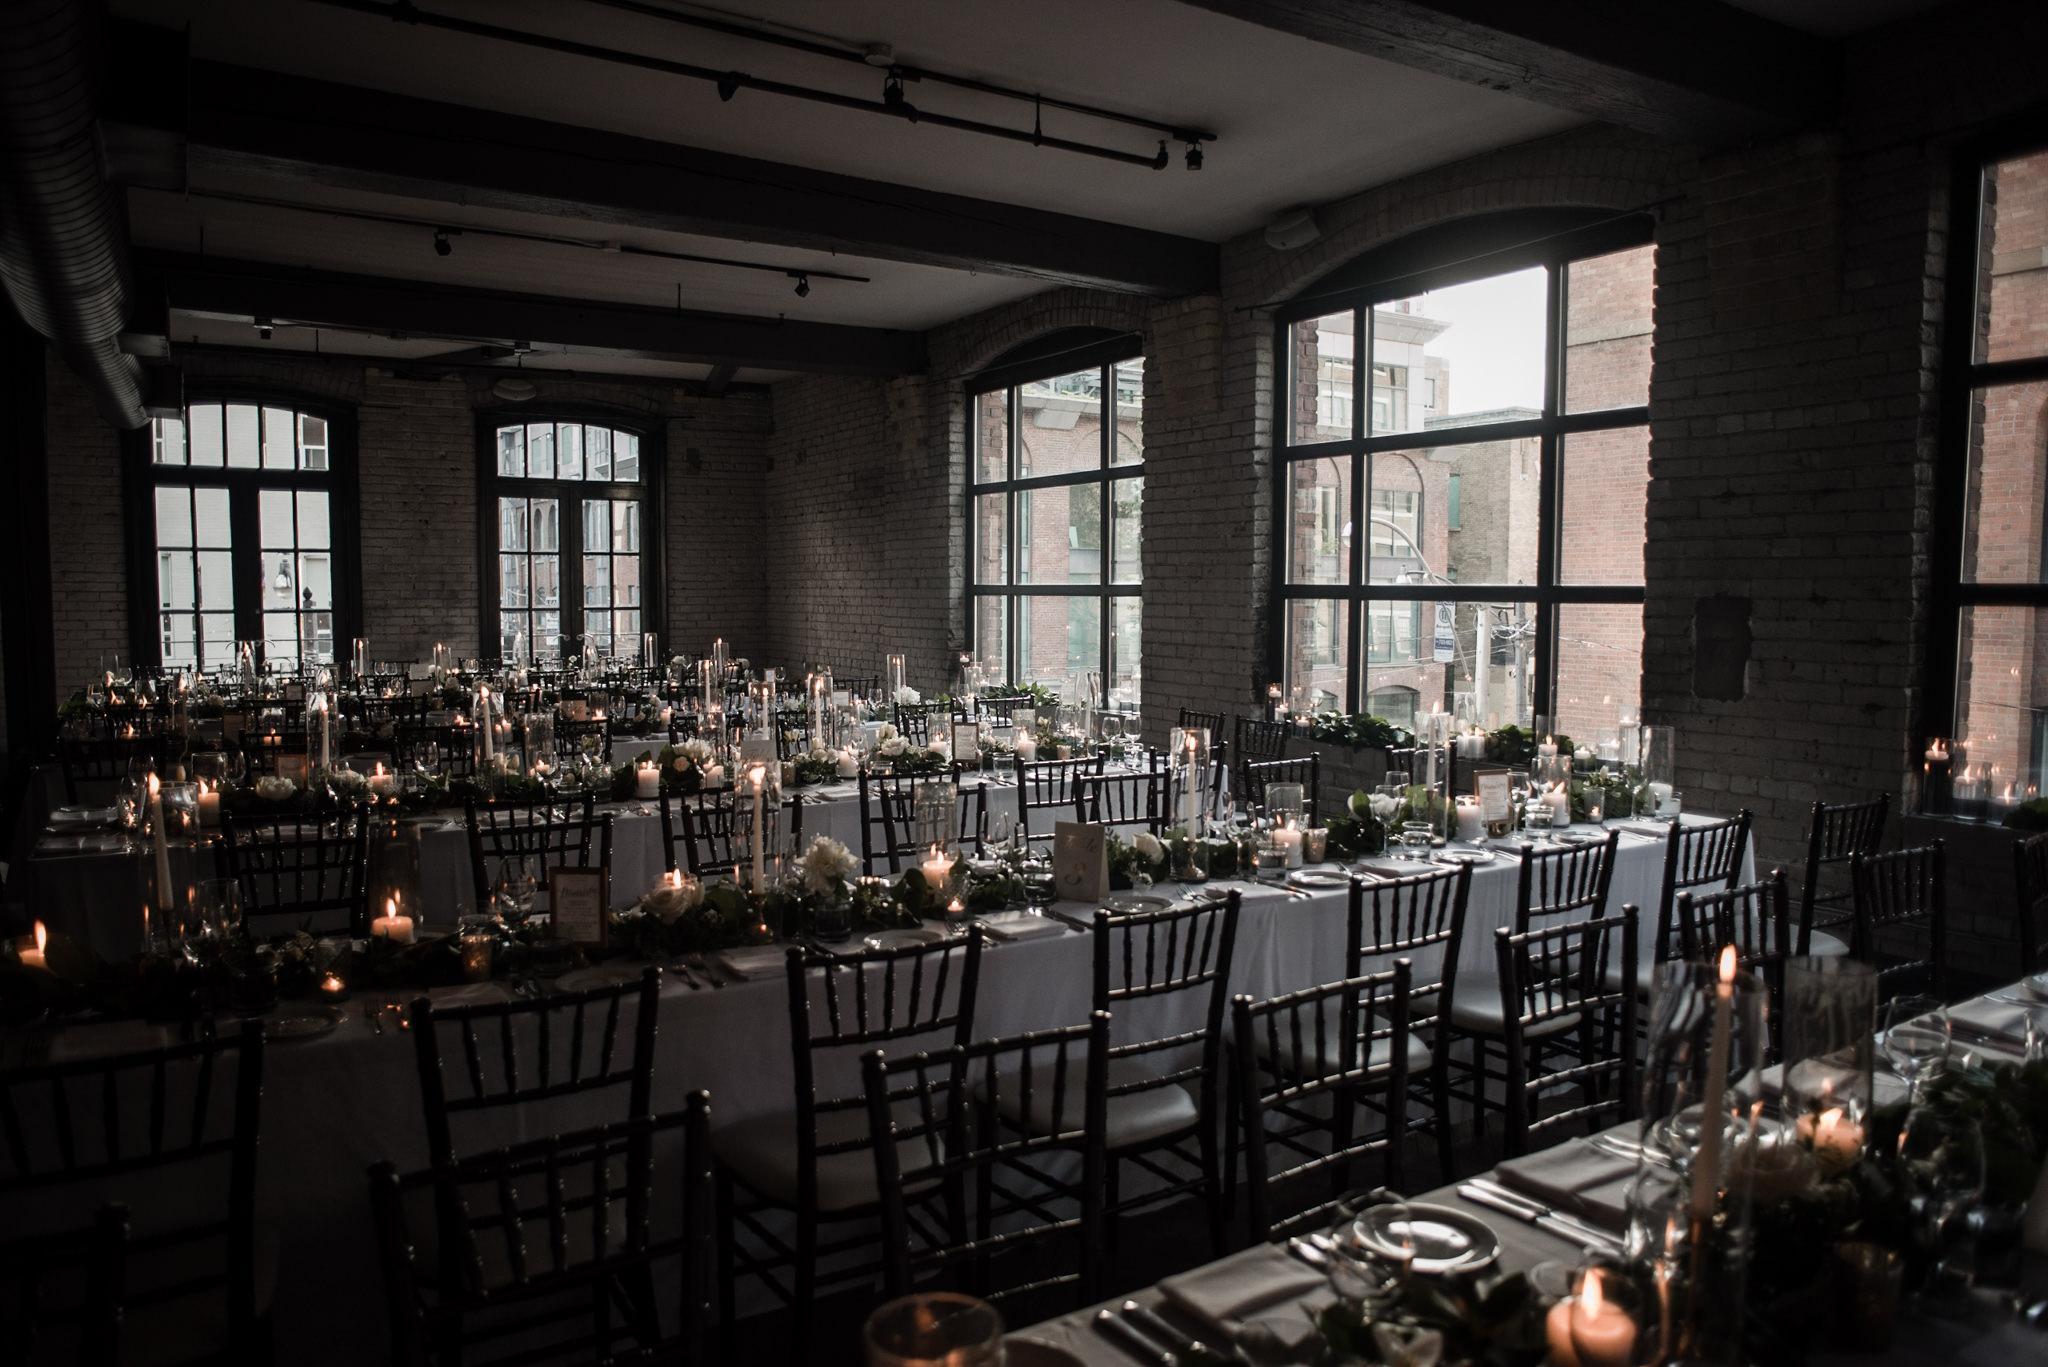 storys-building-industrial-toronto-wedding-reception-set-up.jpg